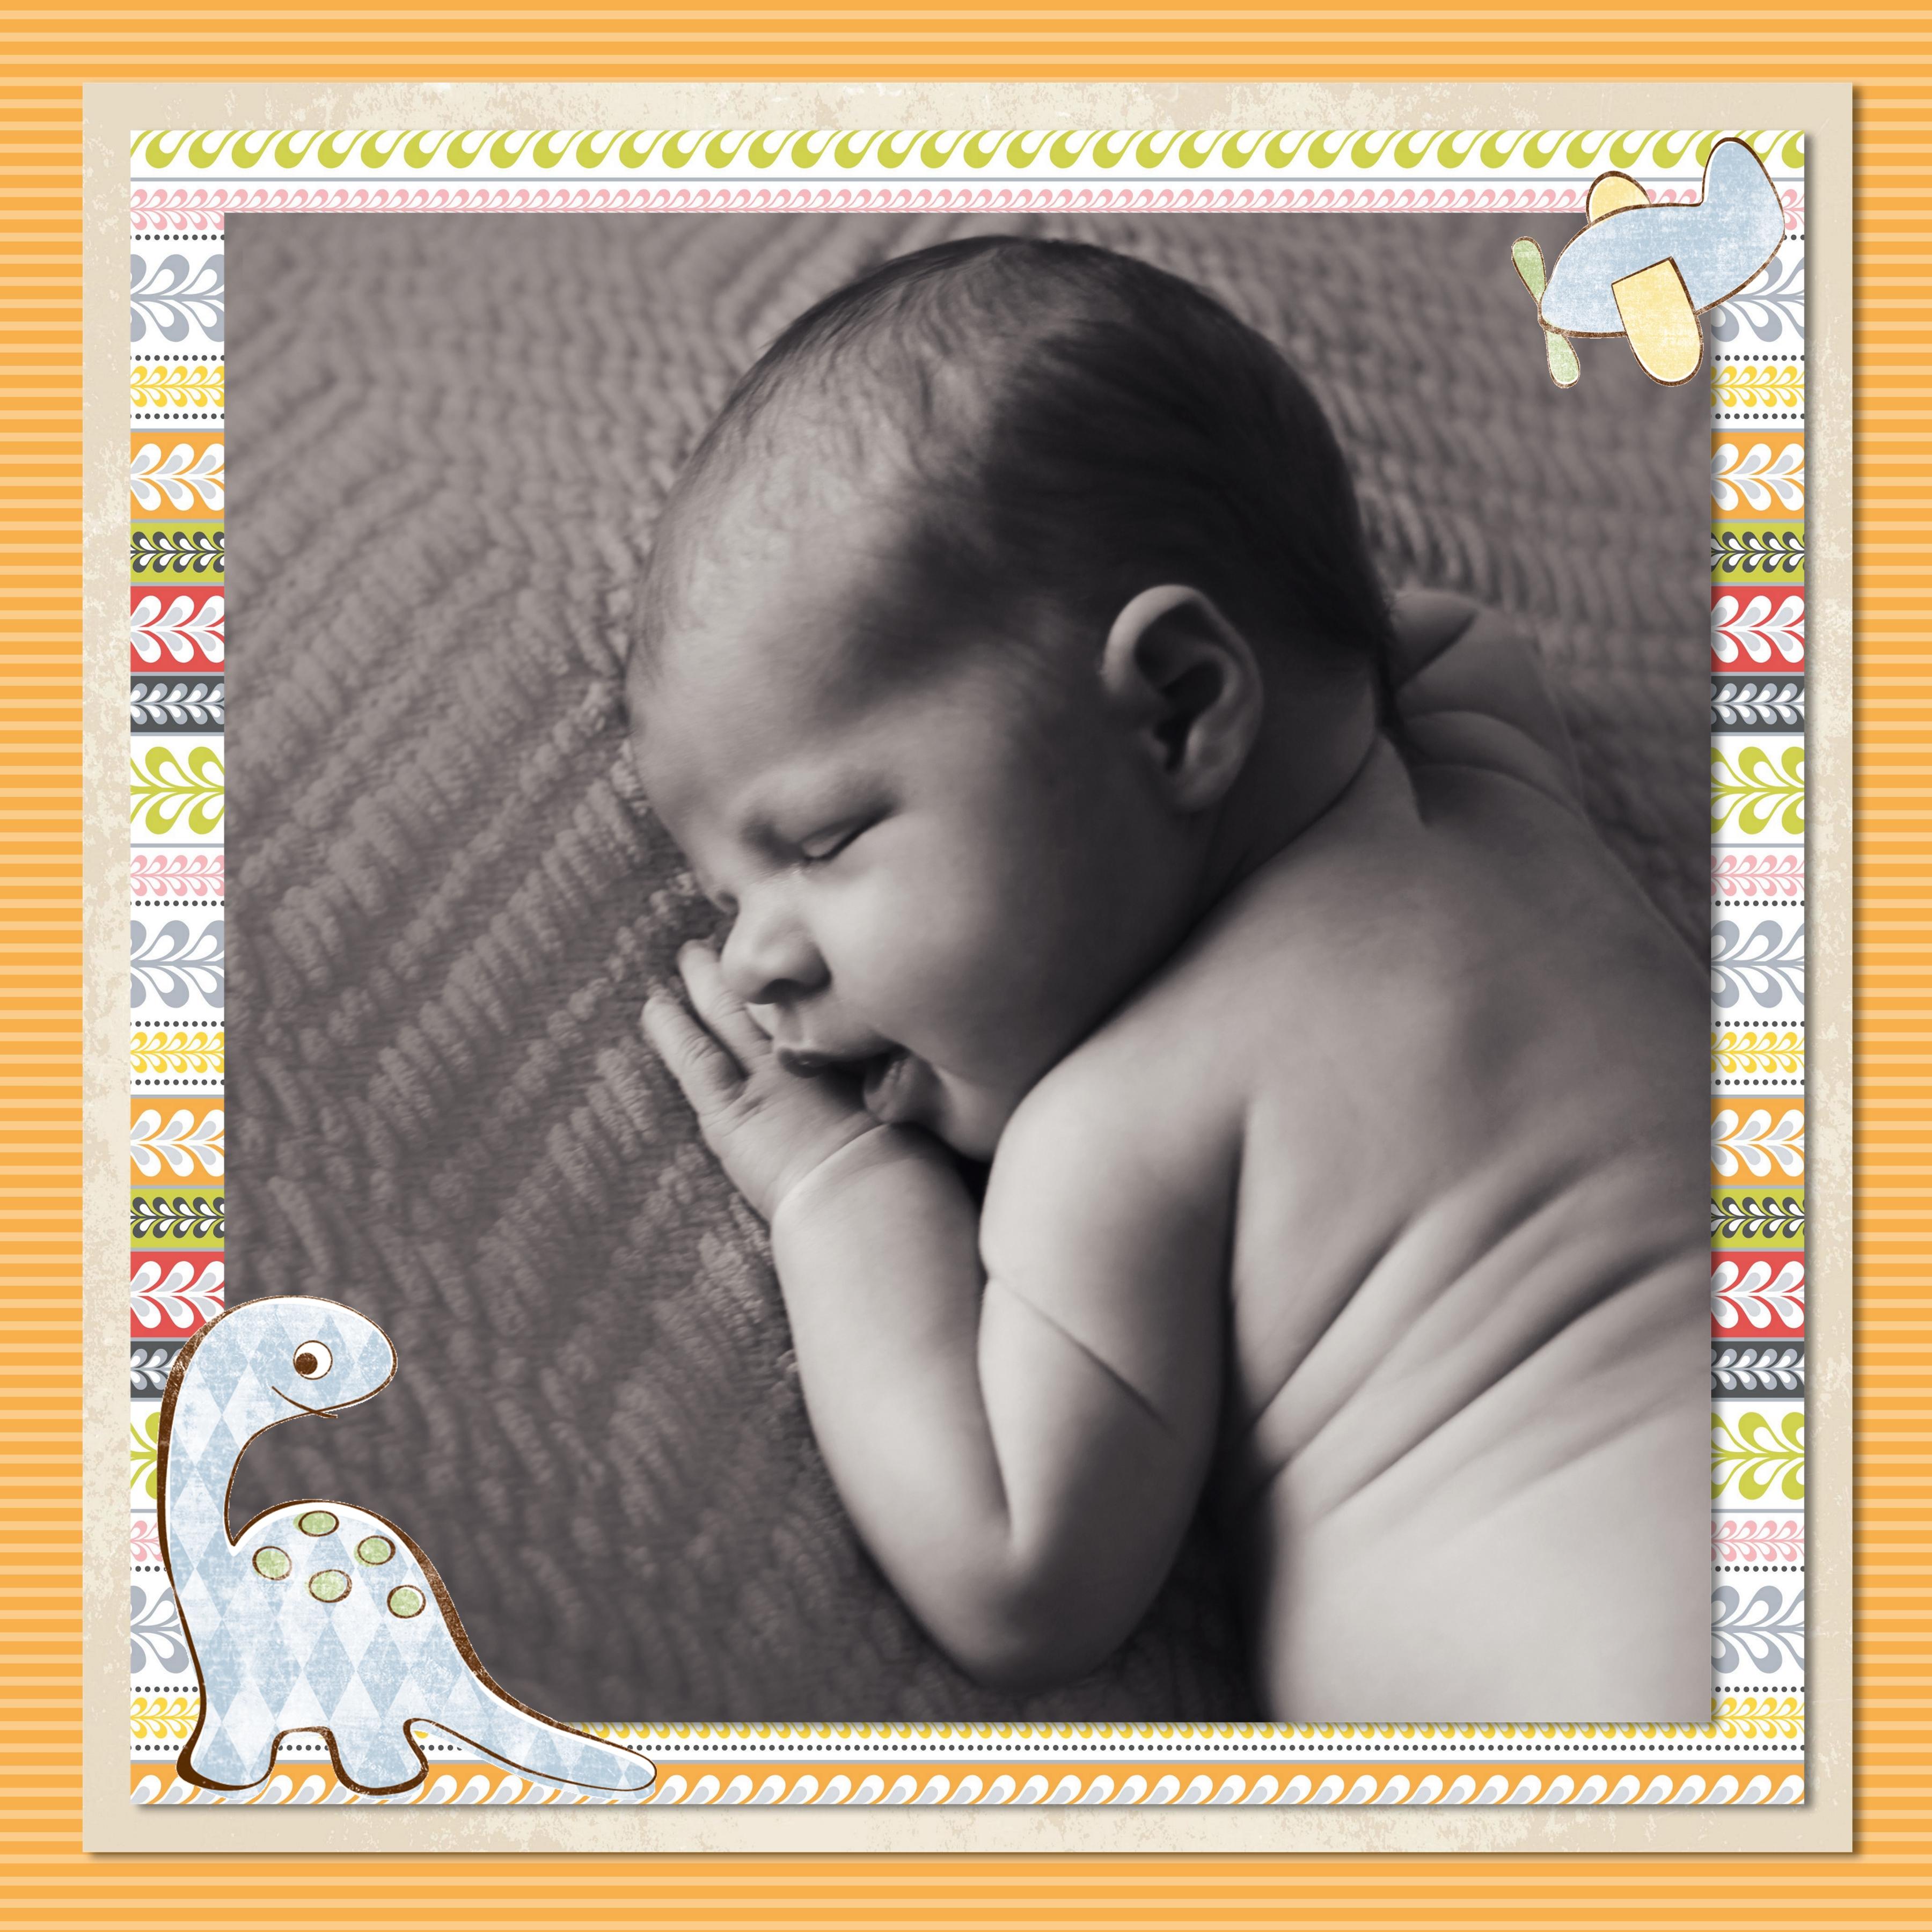 BabyBoy - Page 019.jpg